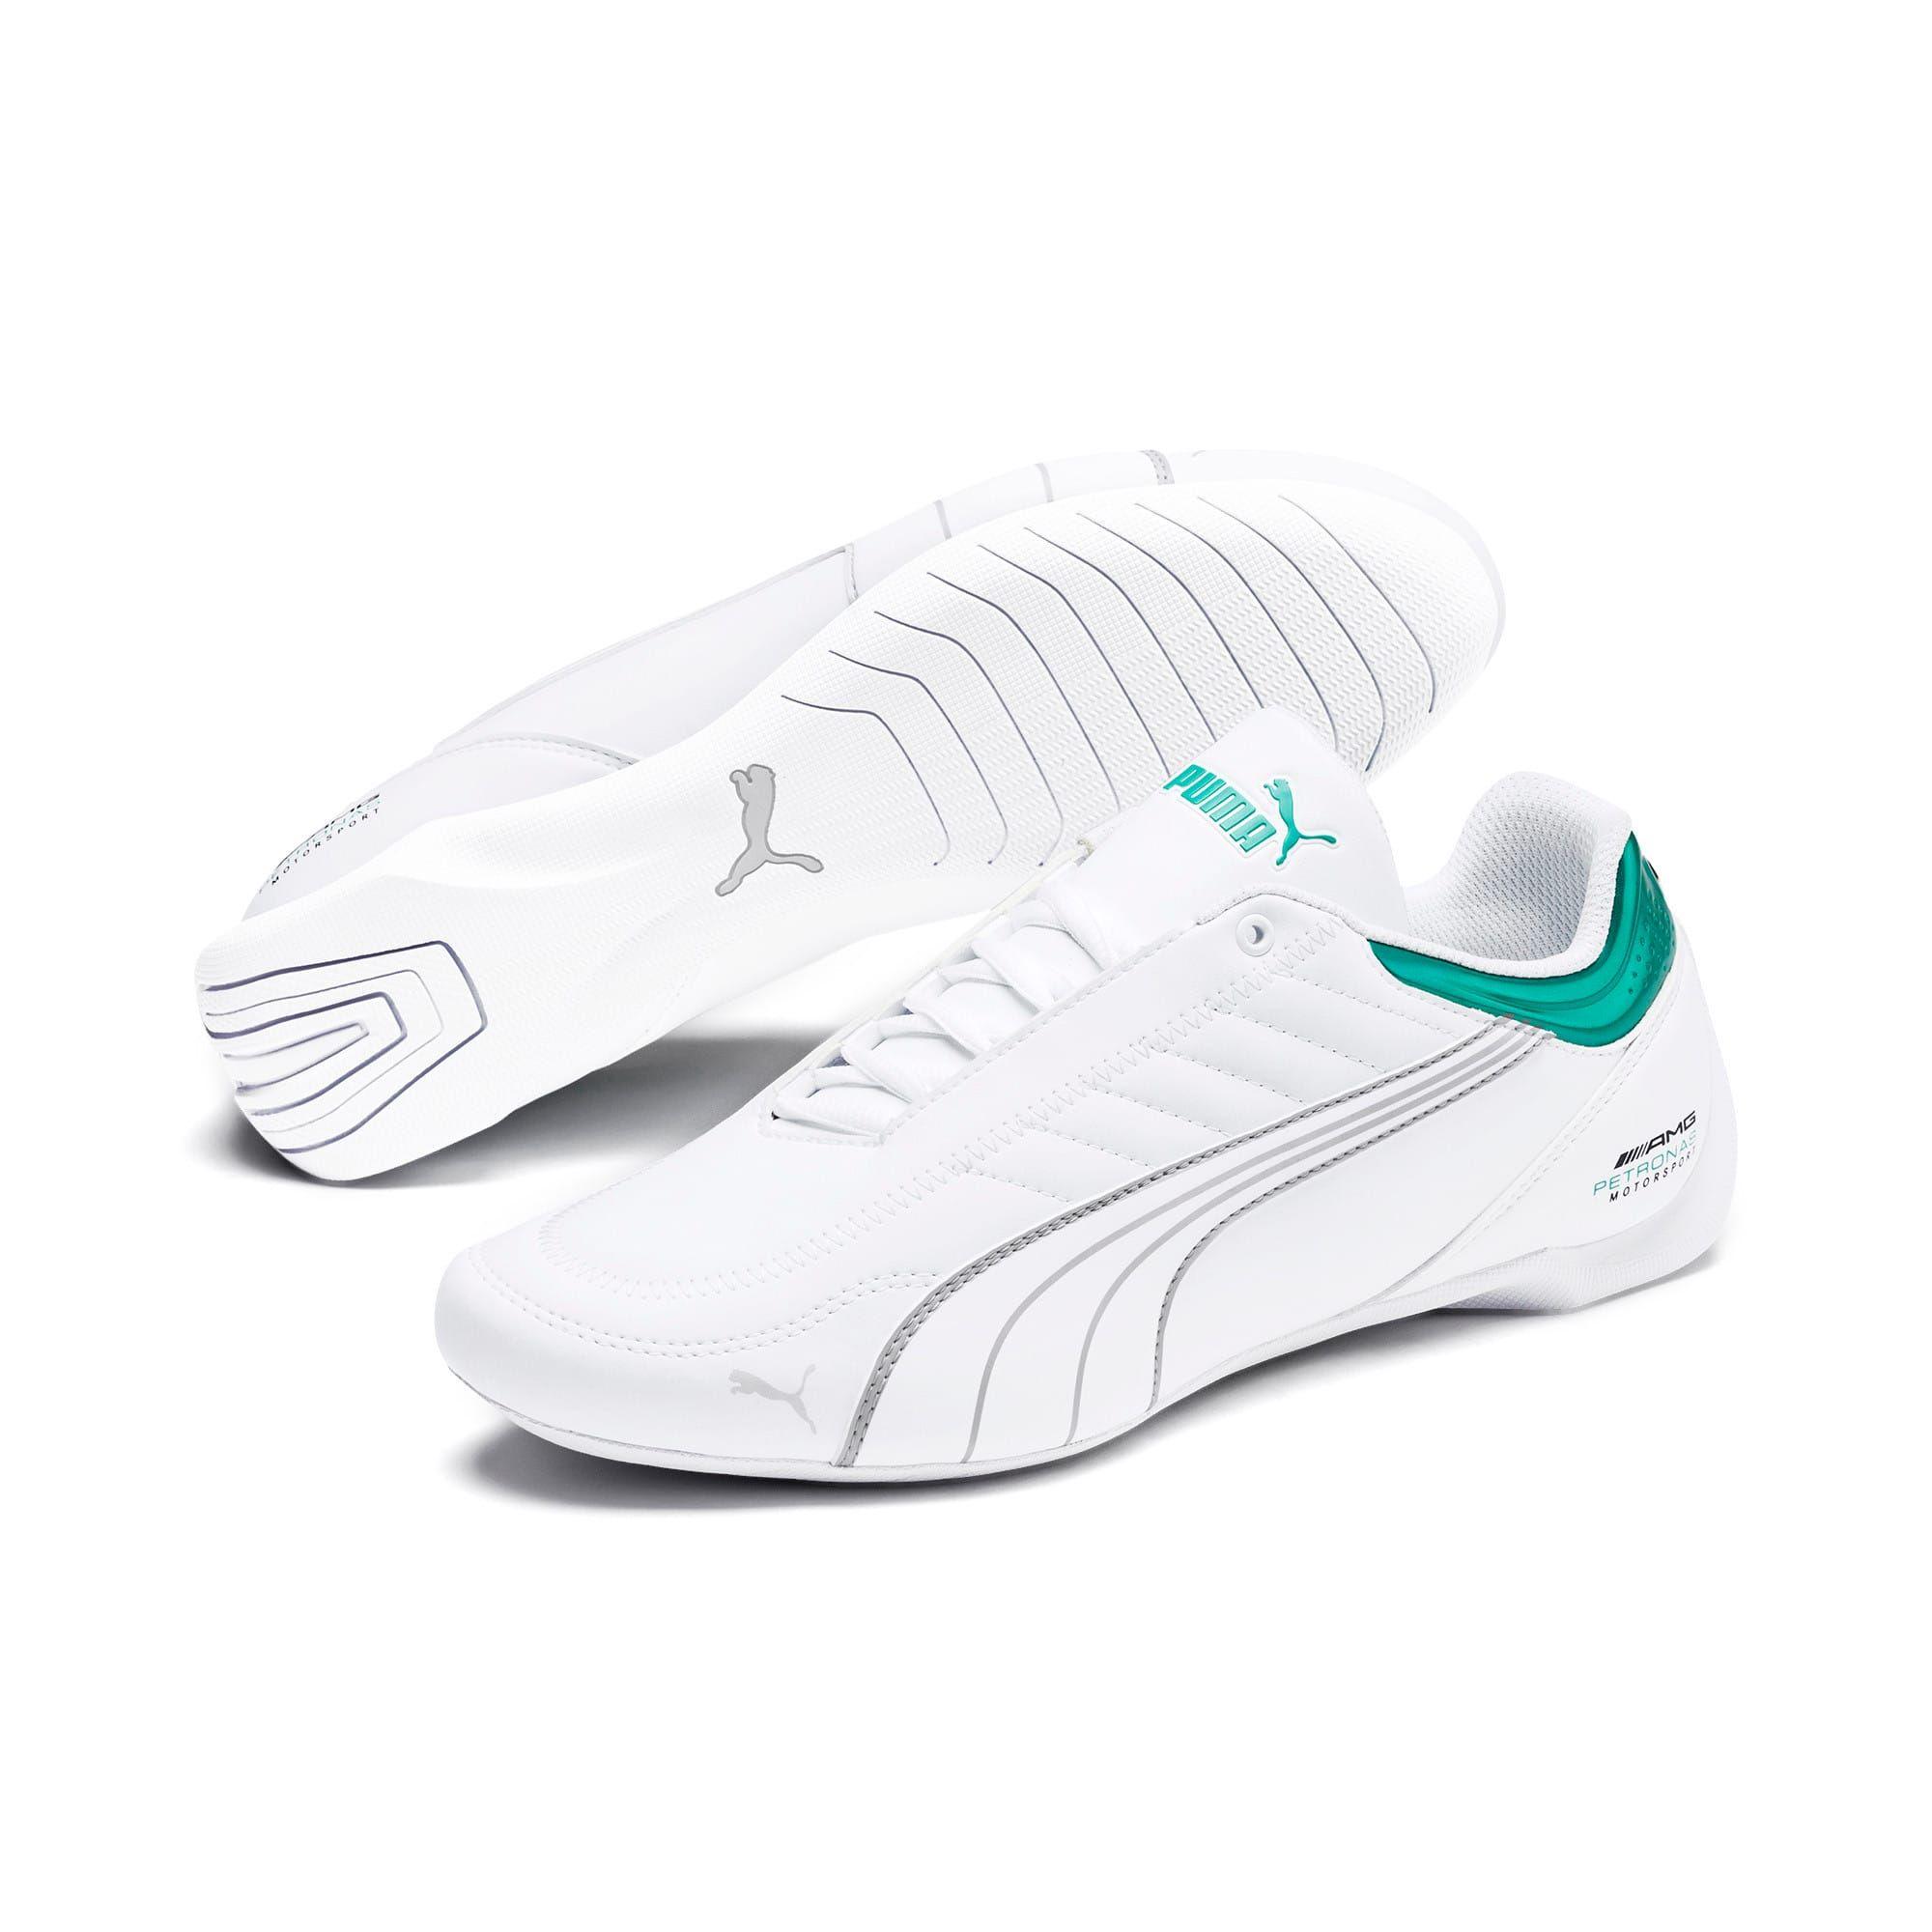 chaussure puma amg